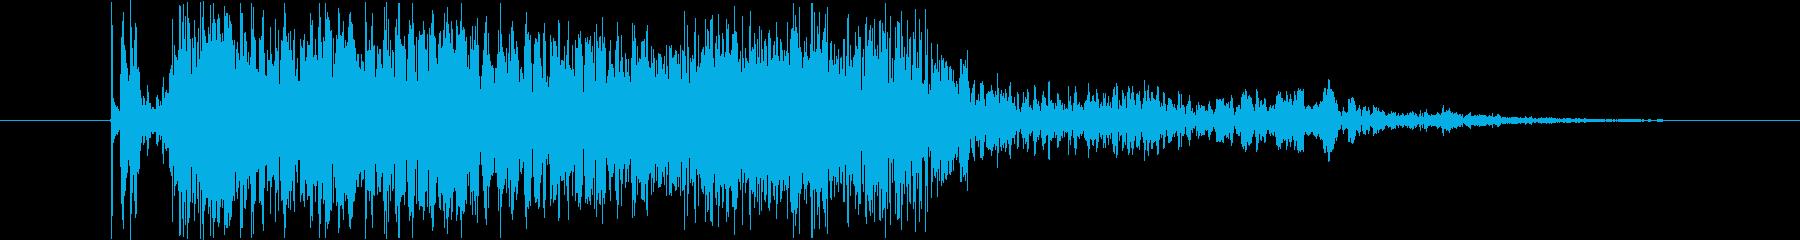 SCI FI 負のヘビー03をクリ...の再生済みの波形